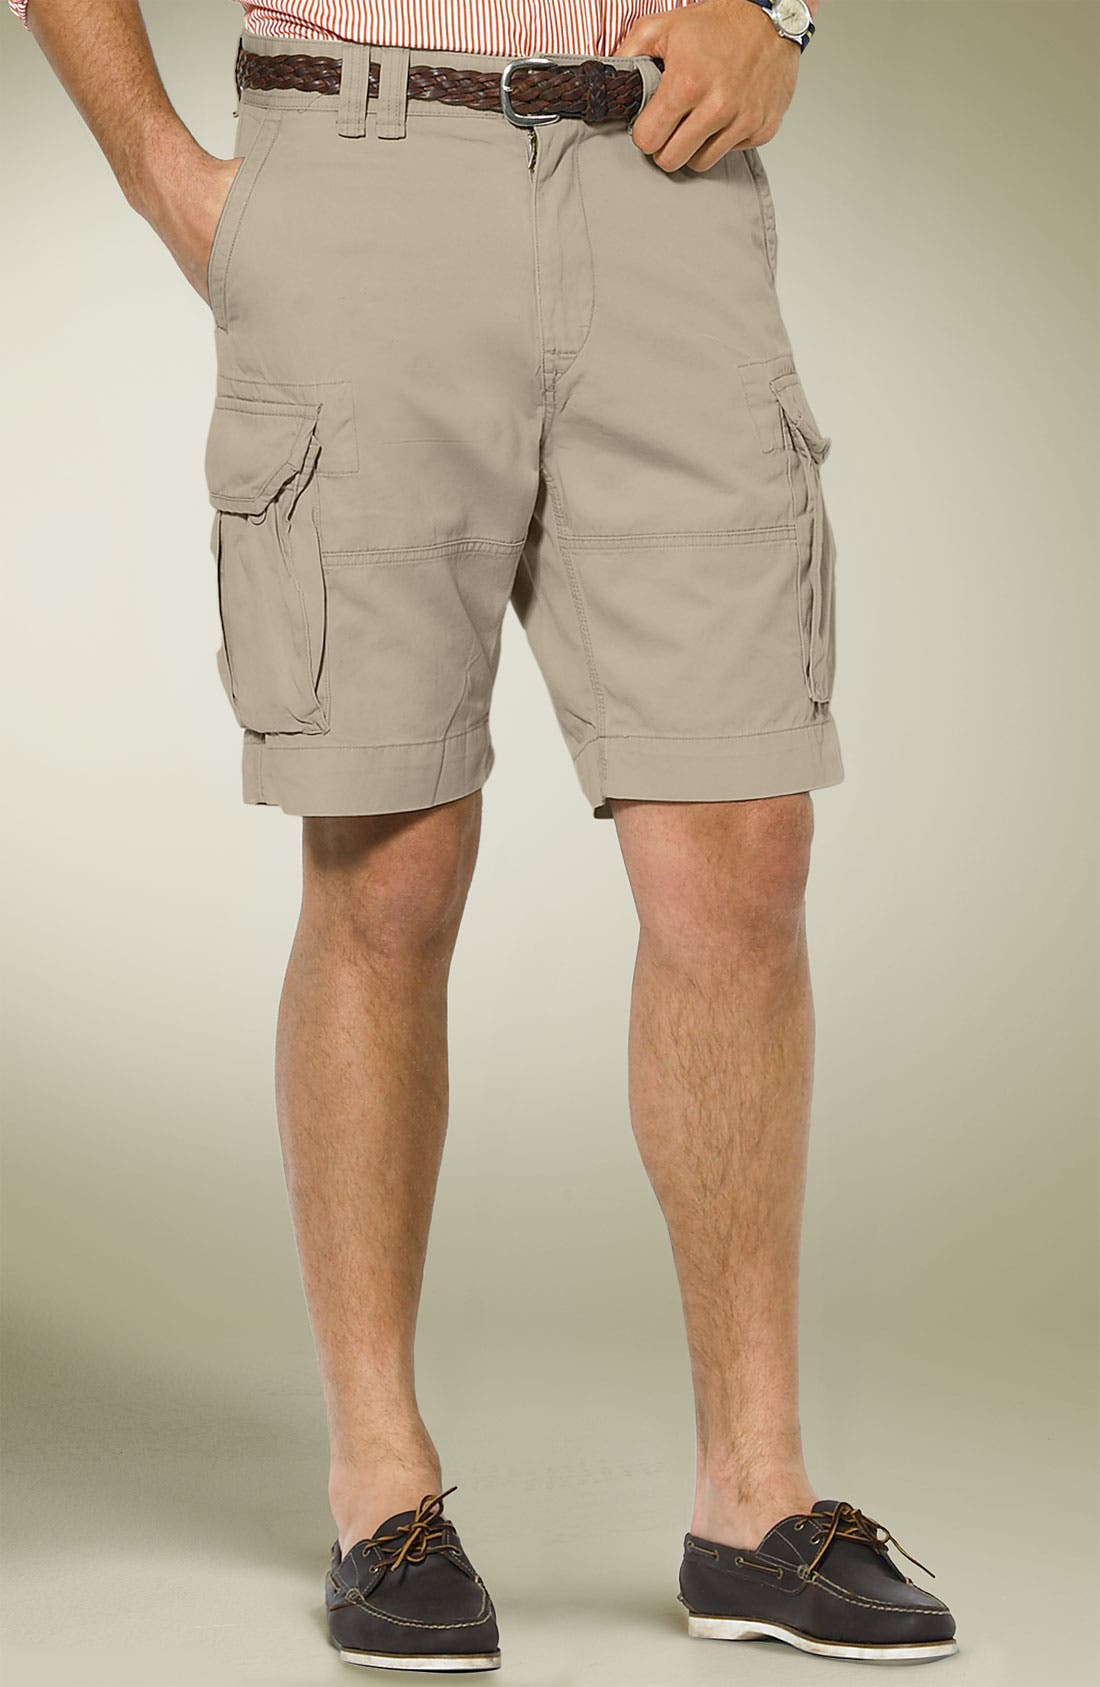 Main Image - Polo Ralph Lauren 'Gellar' Fatigue Cargo Shorts